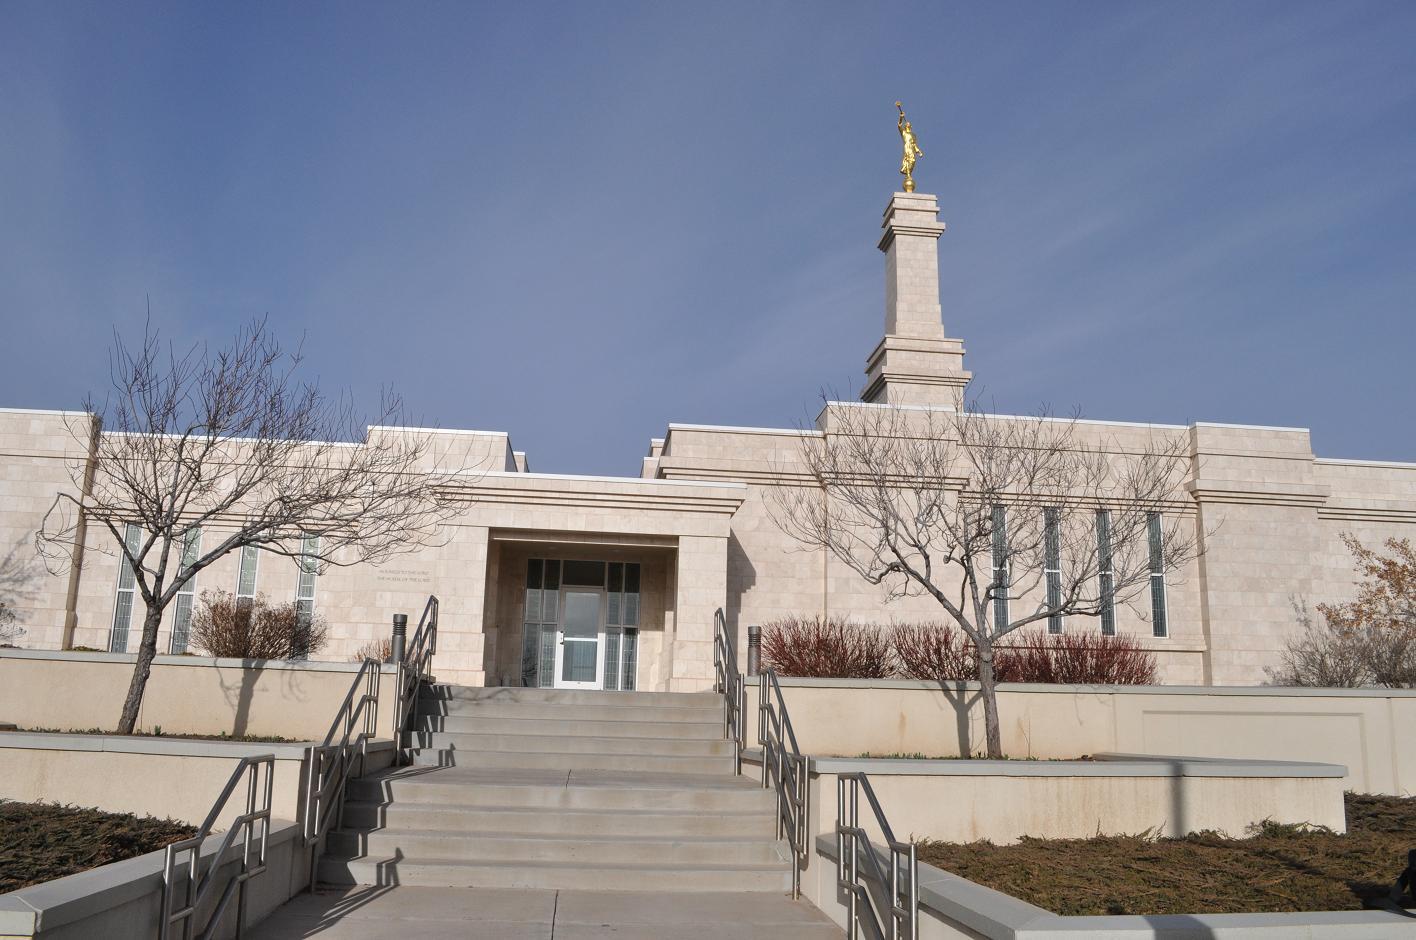 Temple Tourism: Monticello Utah Temple